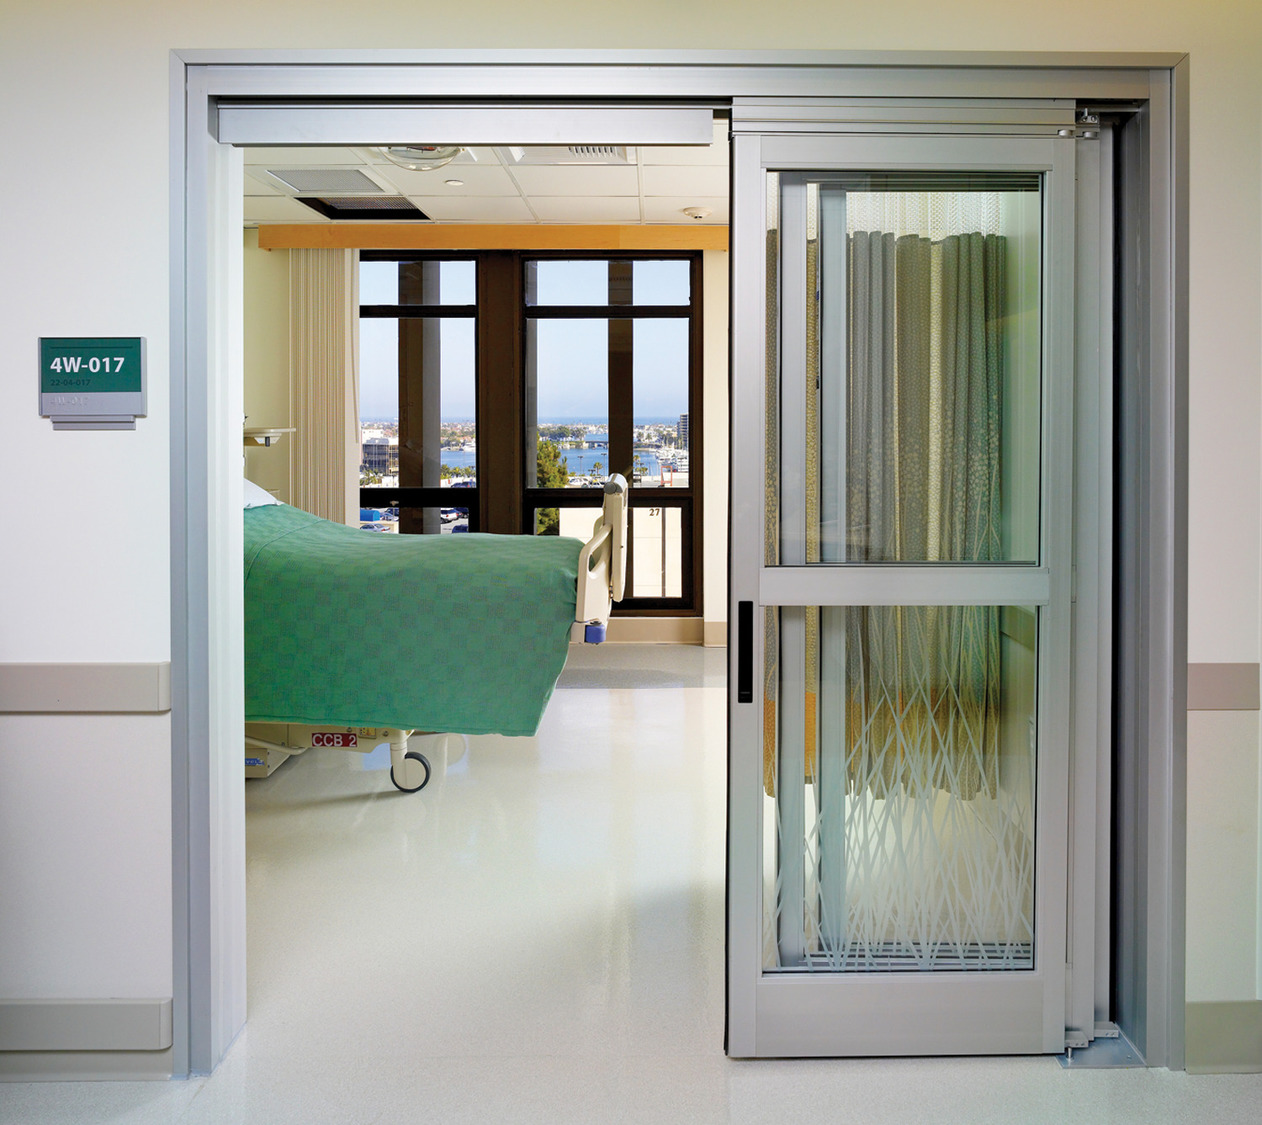 Taylor Design - Patient Room